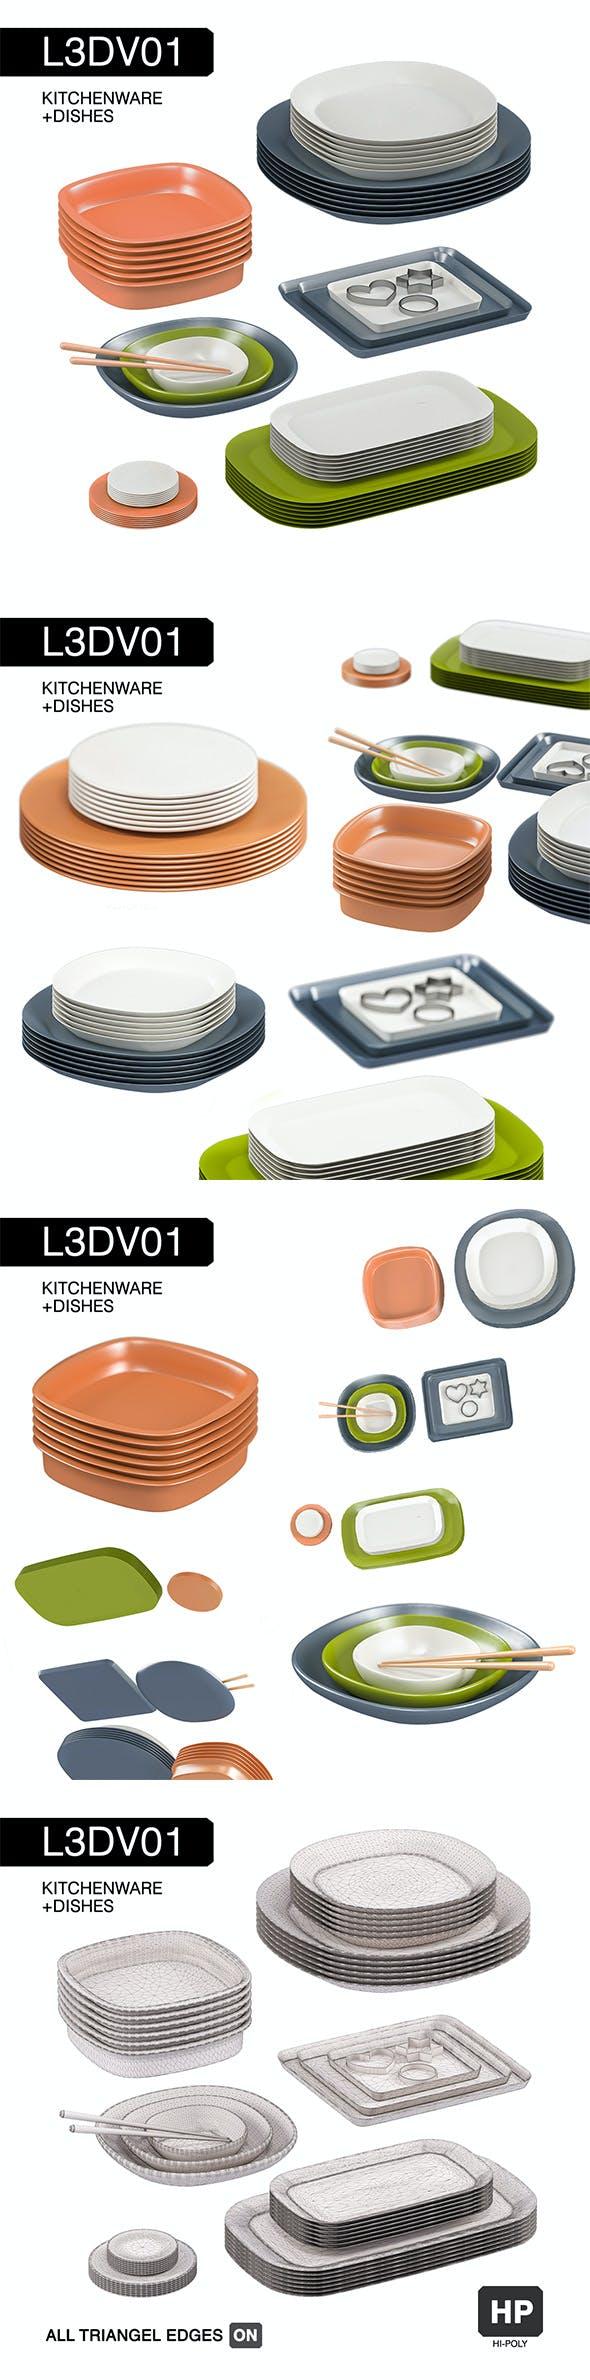 L3DV01G02 - kitchen dishes set - 3DOcean Item for Sale